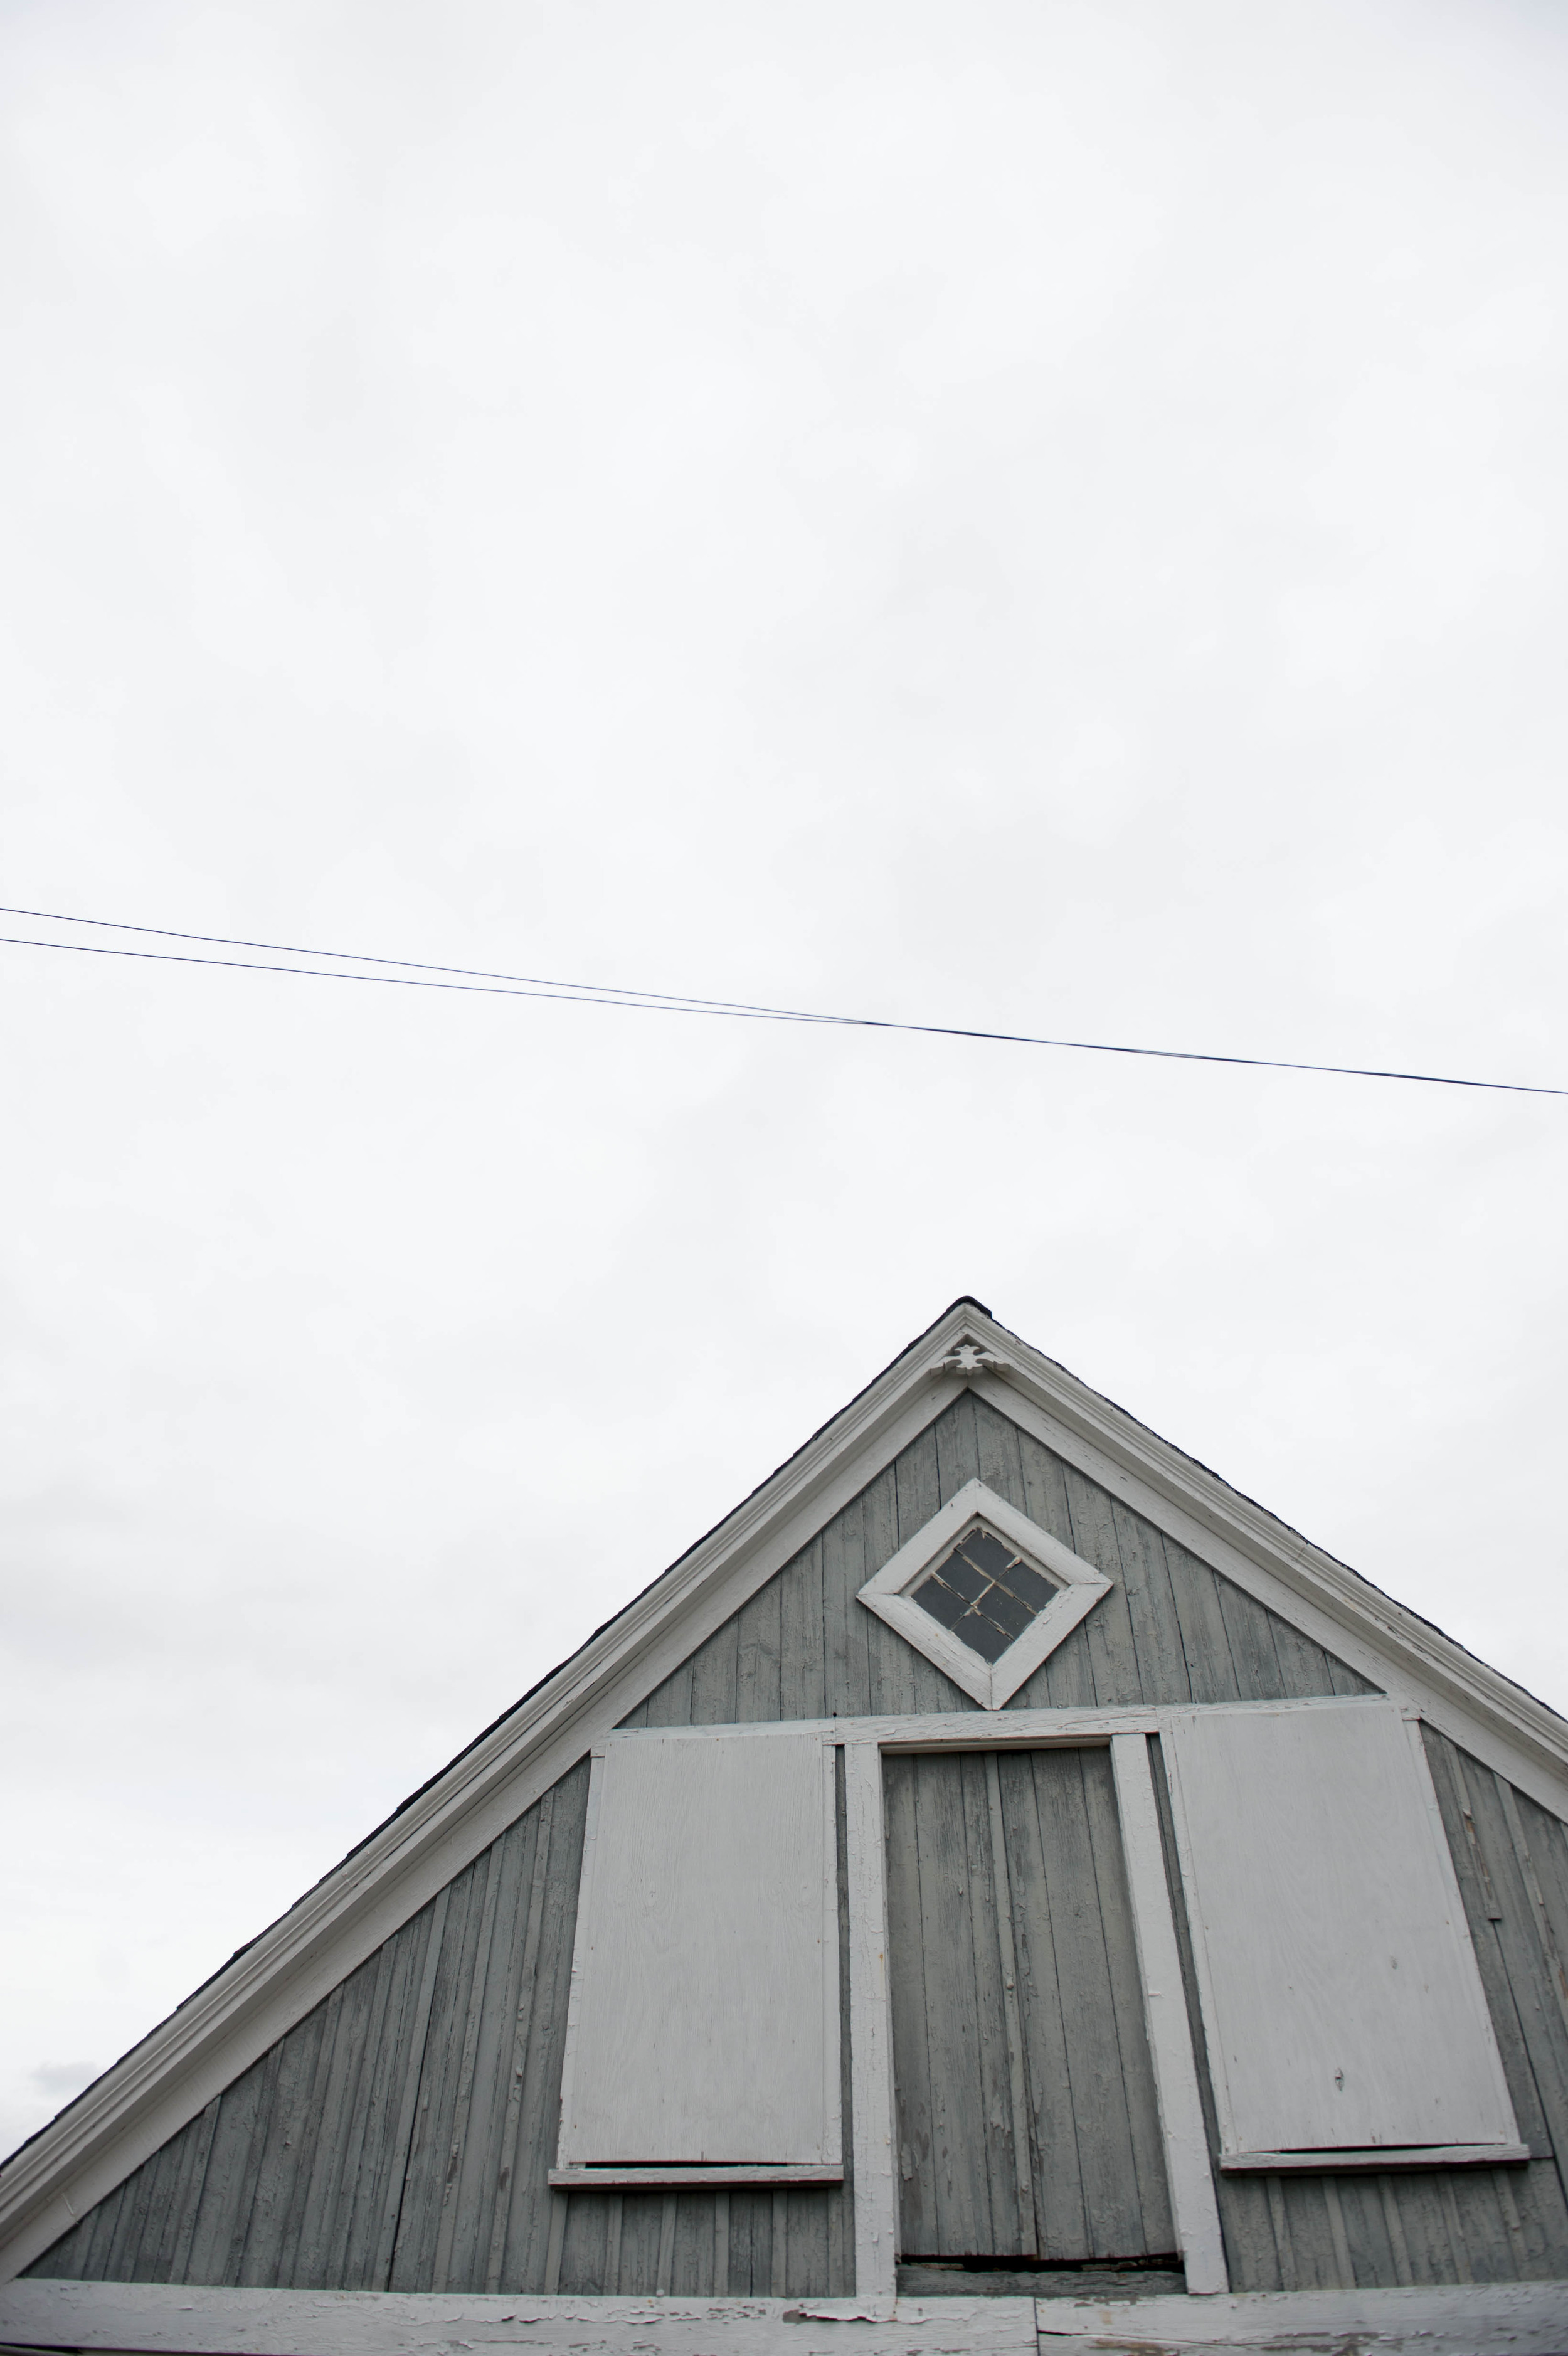 Lilac_Farm_Edible_Boston006.jpg